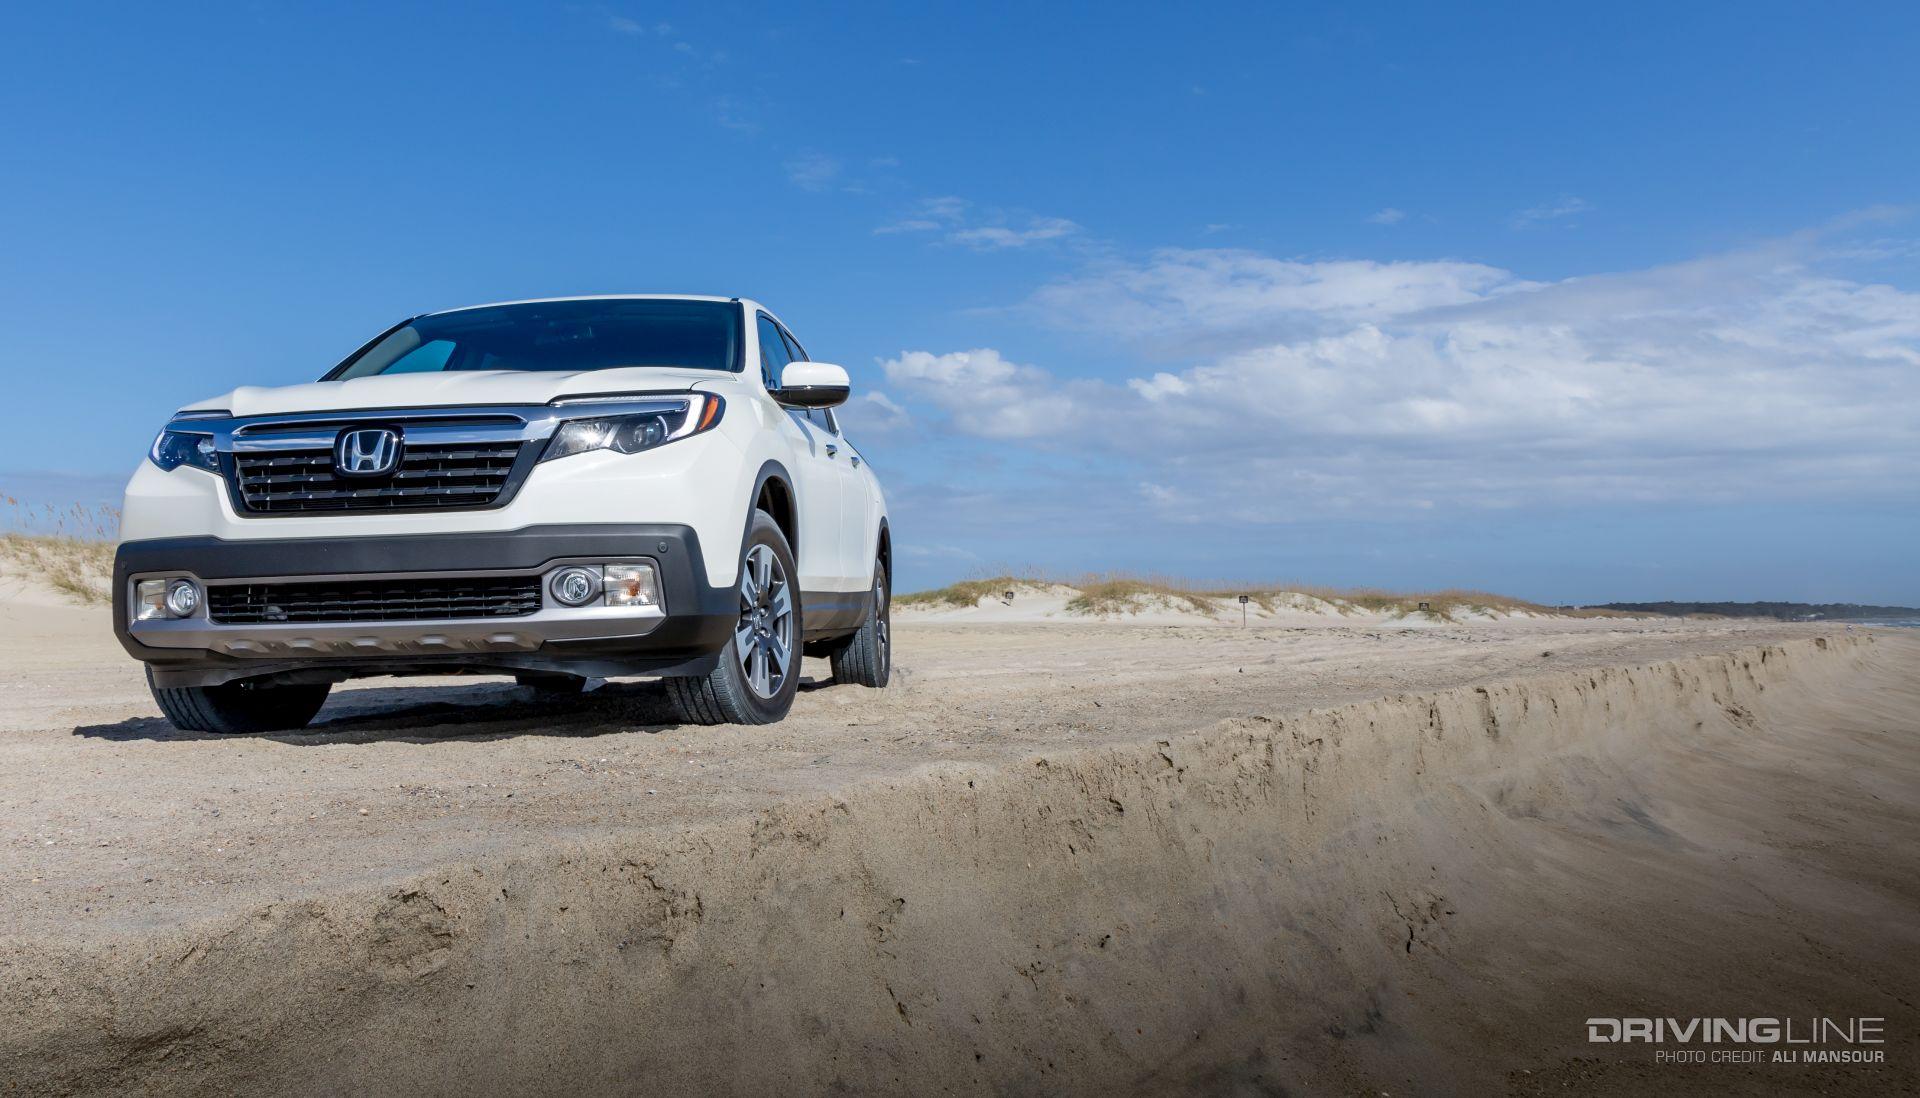 Truck Enough? The 2018 Honda Ridgeline Review | DrivingLine